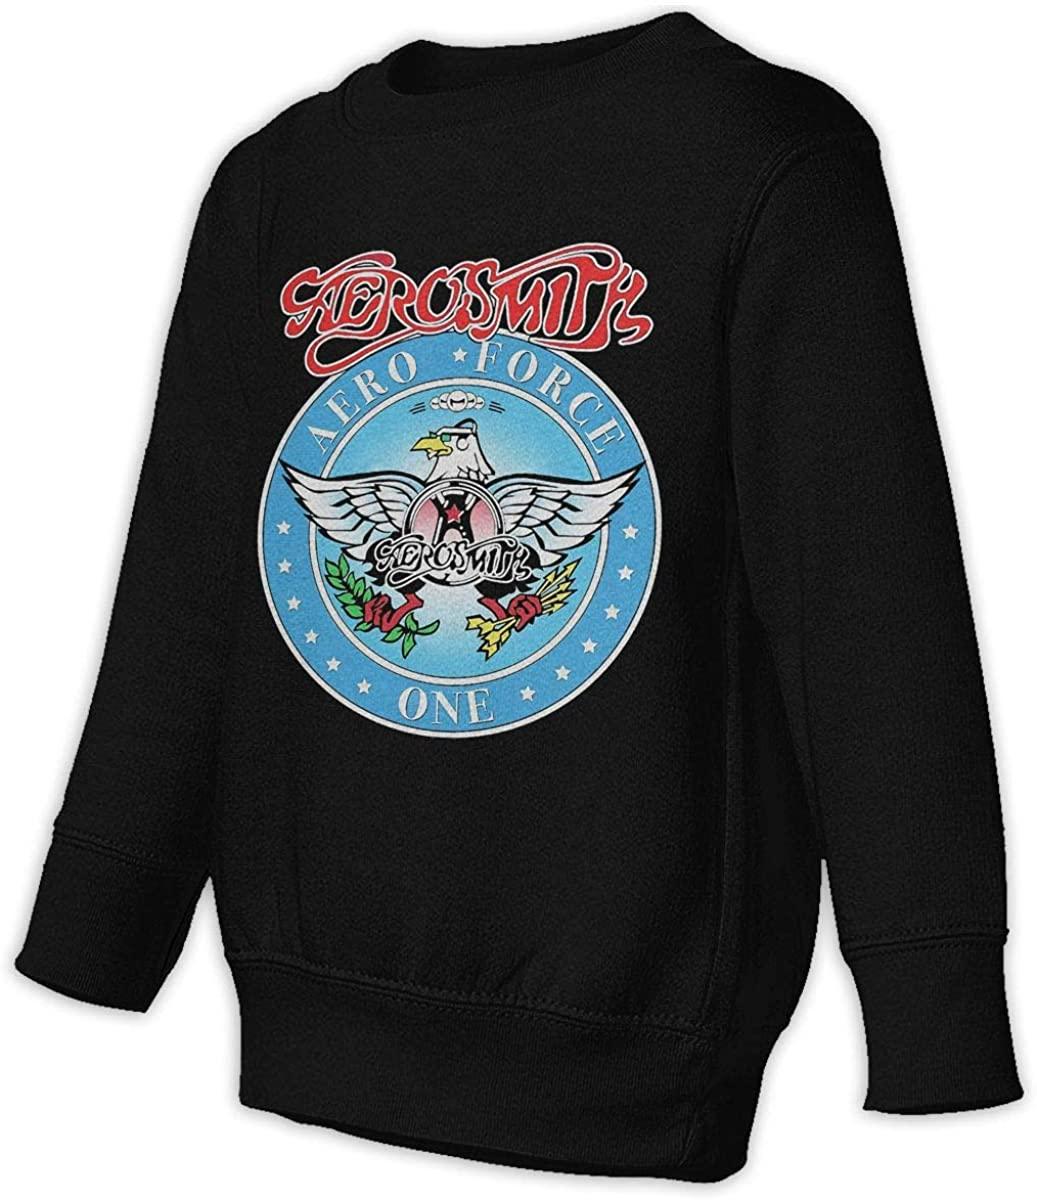 HUYAJGODGP-kiusdm Waynes World Aerosmith Unisex Sweatshirt Youth Boy and Girls Pullover Sweatshirt Black